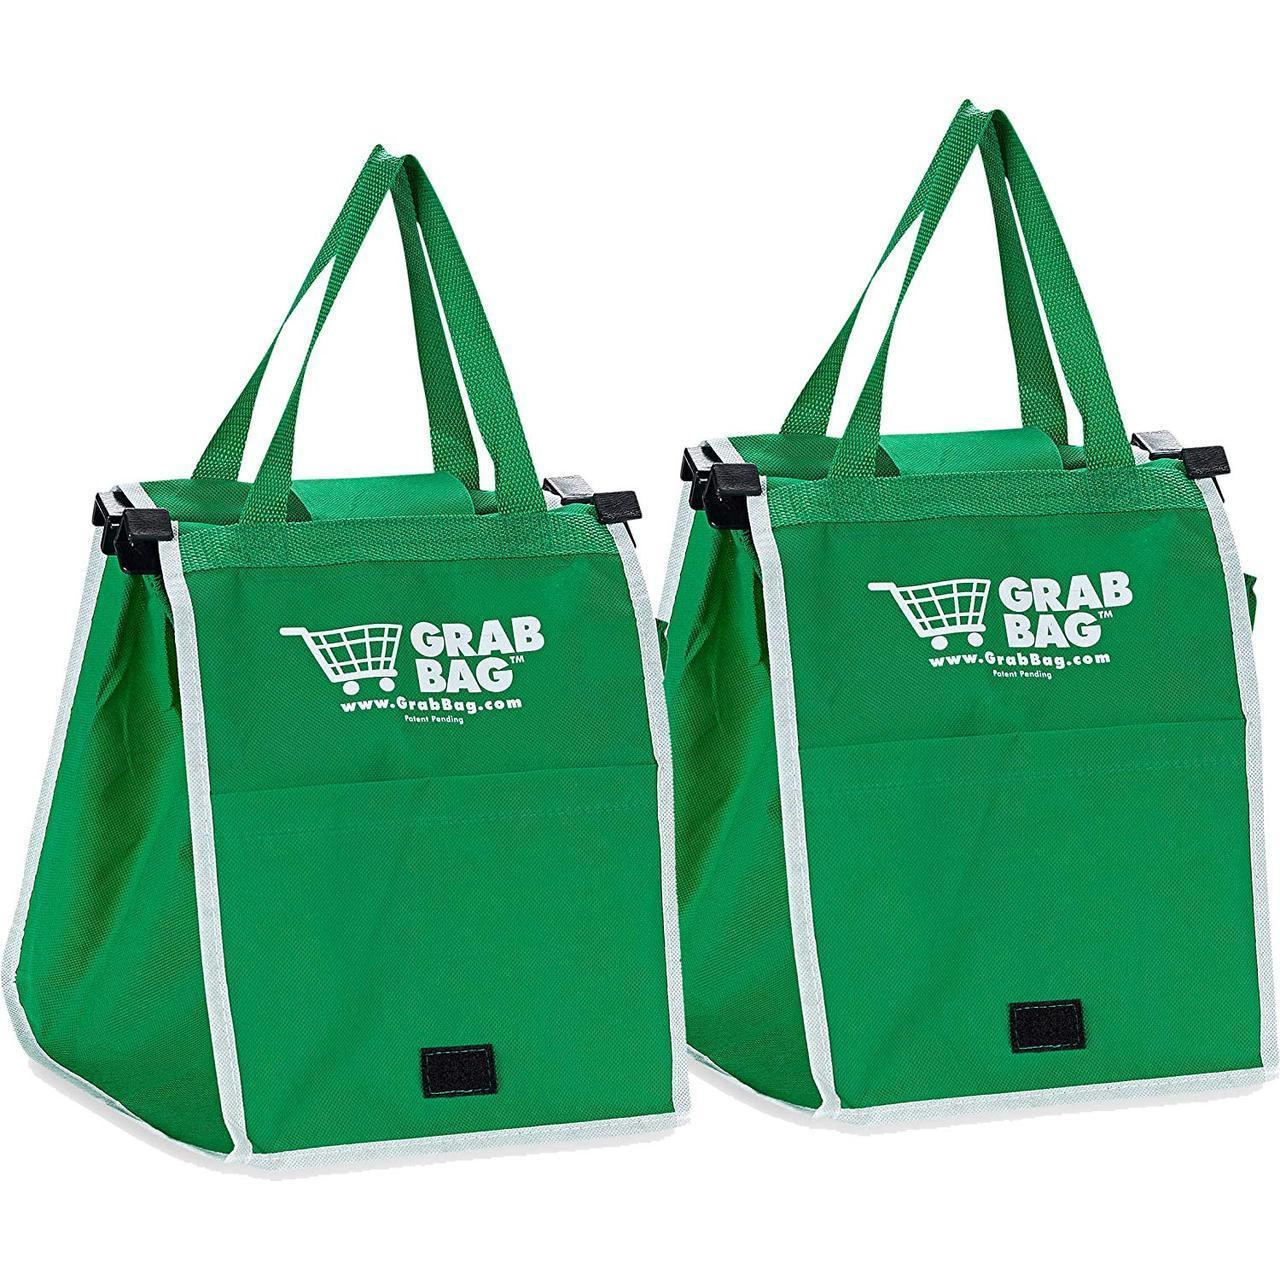 Складная хозяйственная сумка для покупок Grab Bag 2 шт